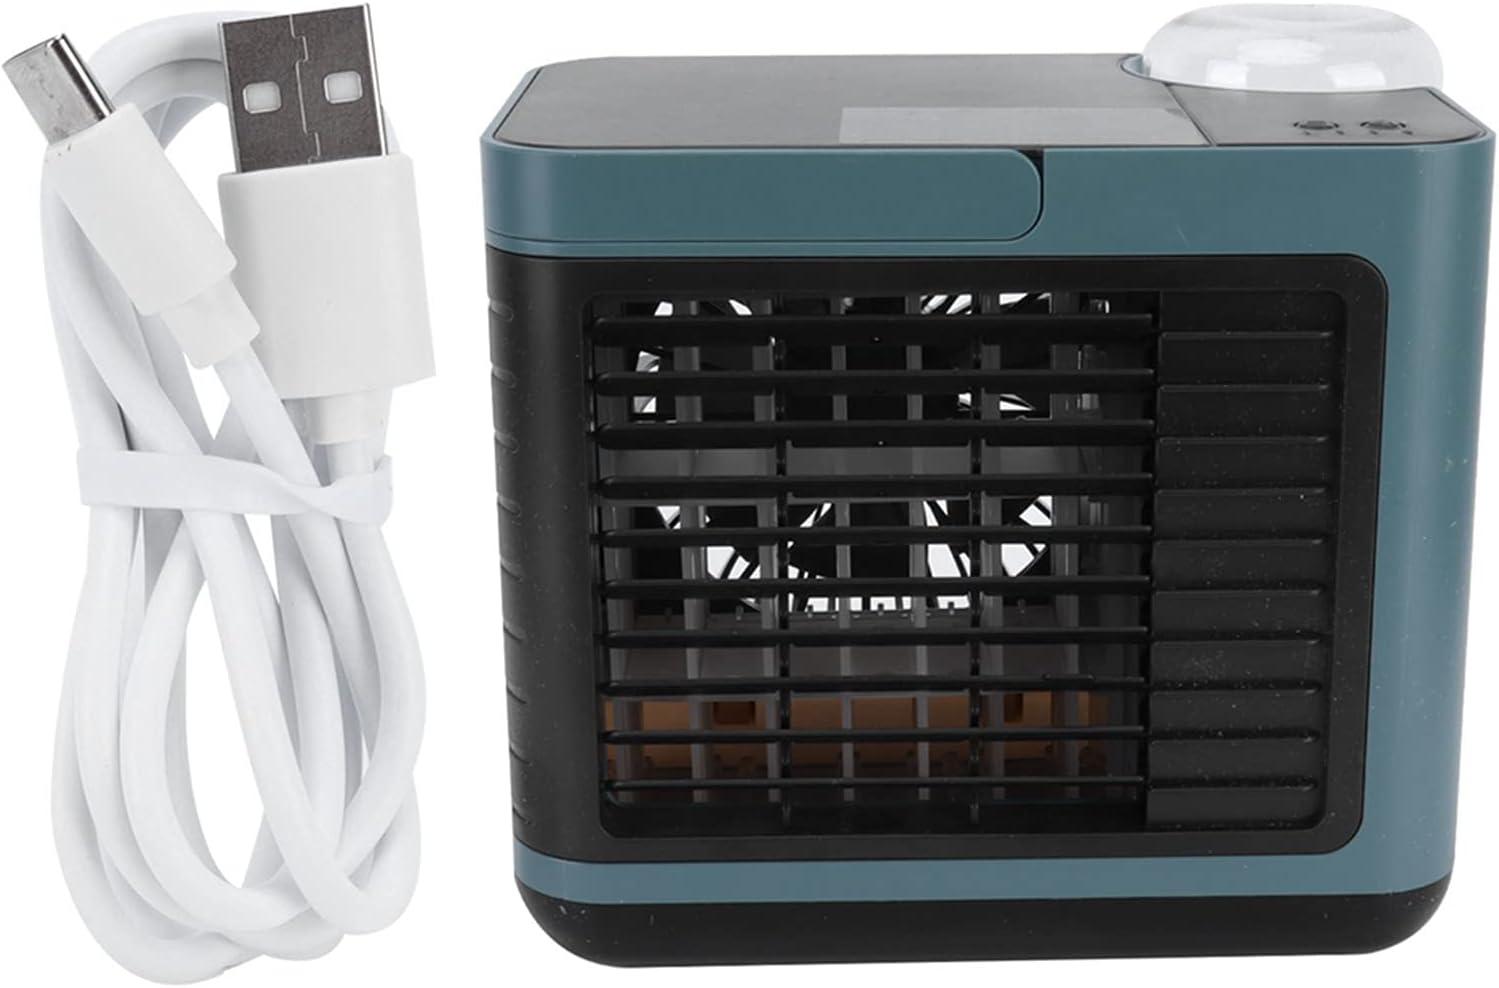 Mini Air Conditioner Los Angeles Mall In stock Three‑Dimensional Wide‑Angle